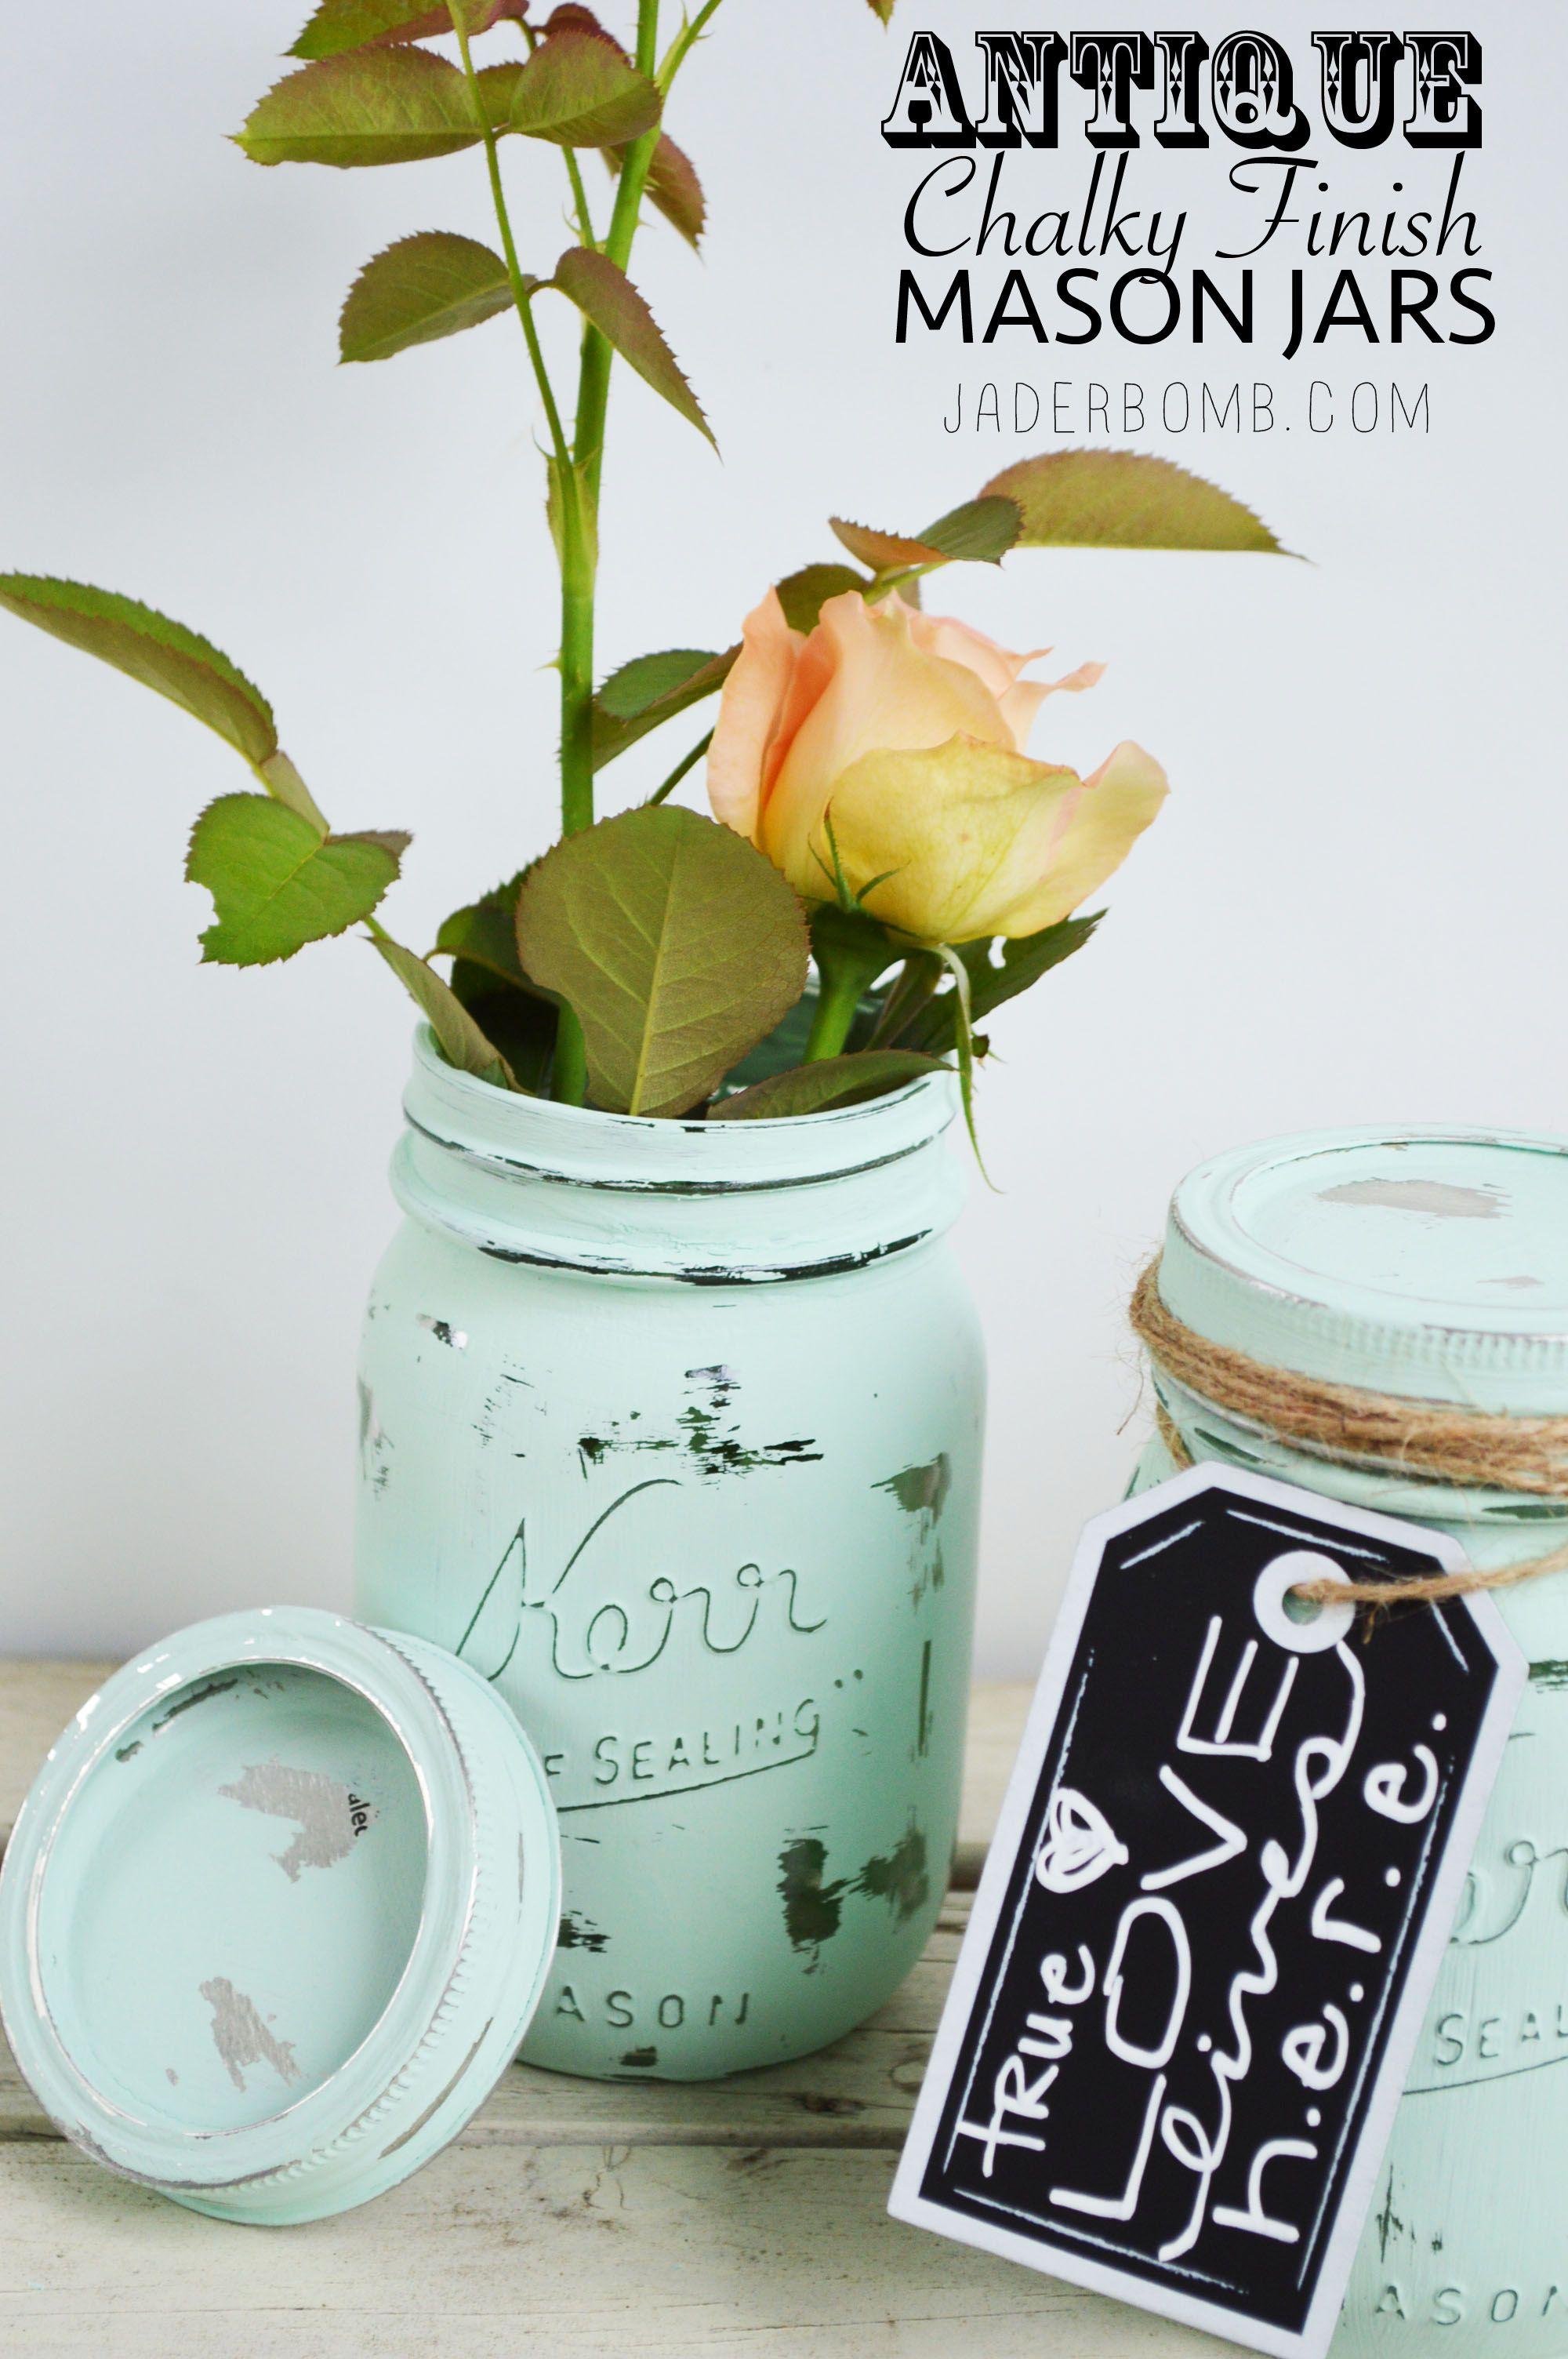 Antique Chalky Finish Mason Jars – Michael's Makers via www.jaderbomb.com #michaelsmakers